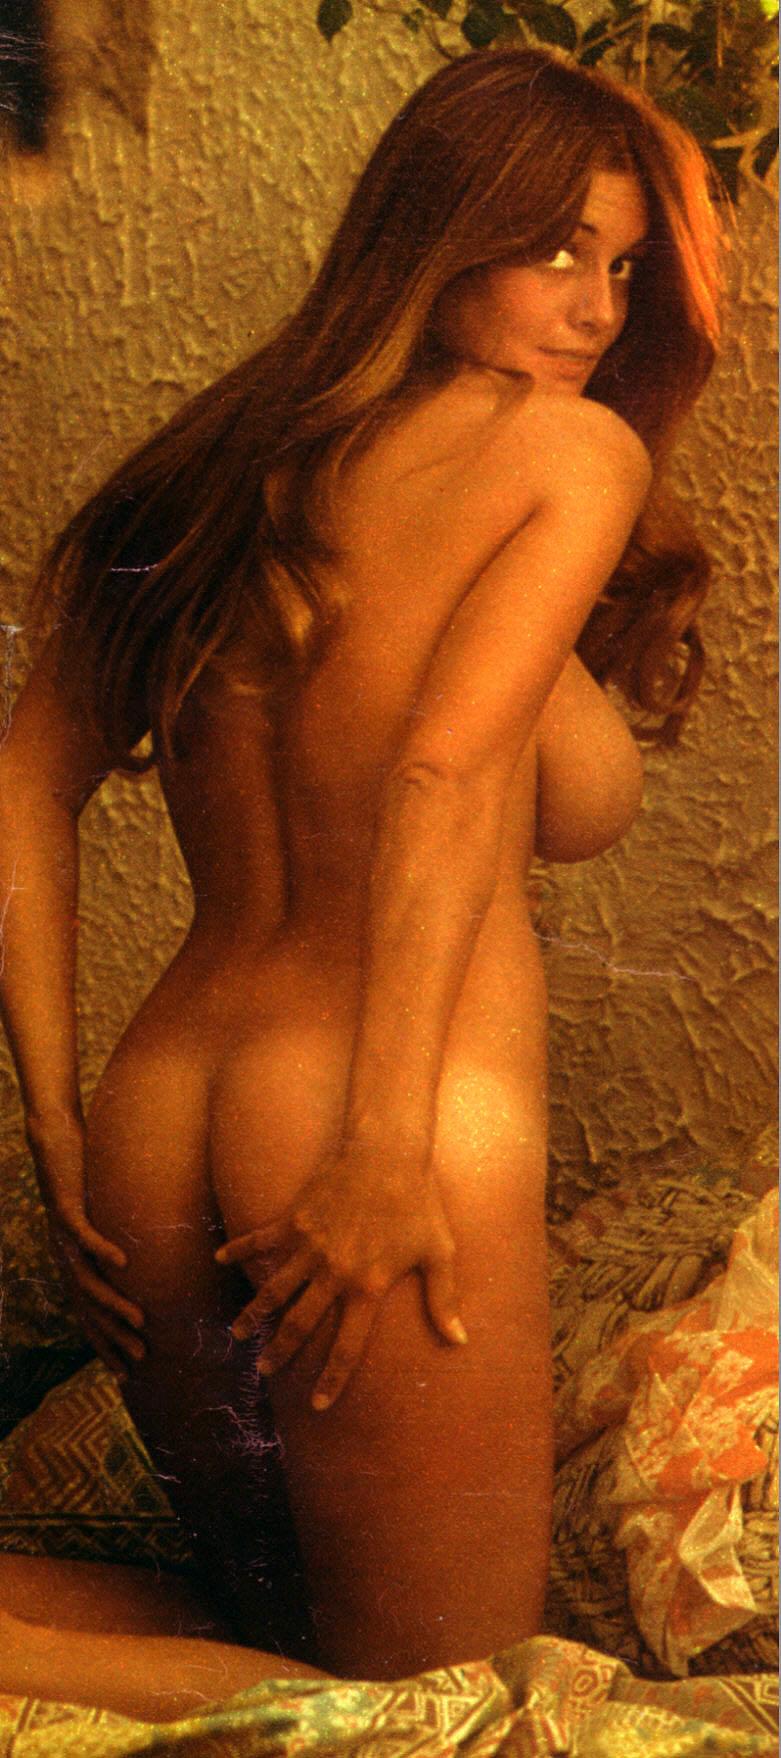 vintage playboy nude pics